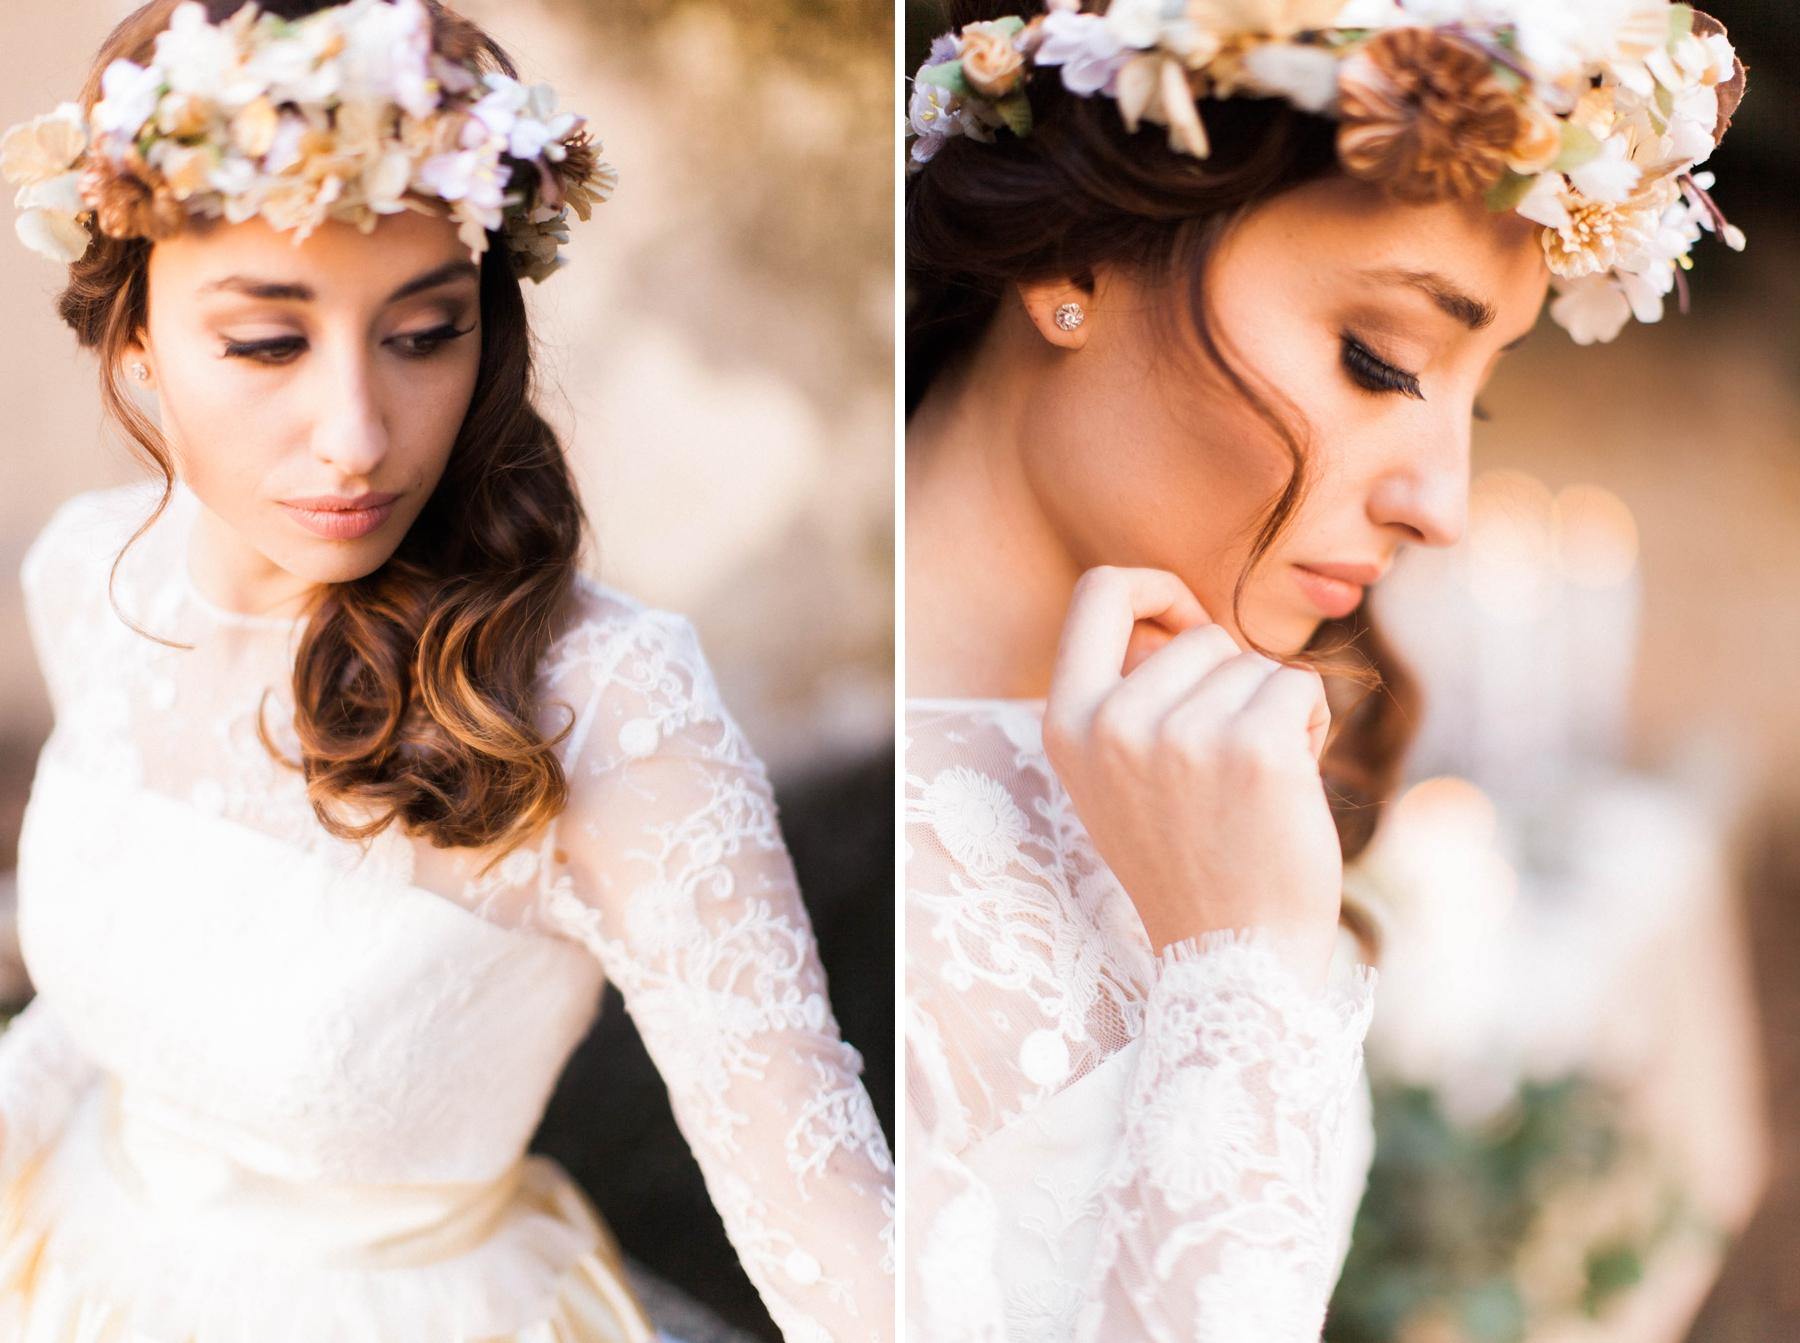 fotografo de bodas Jairo Crena-103